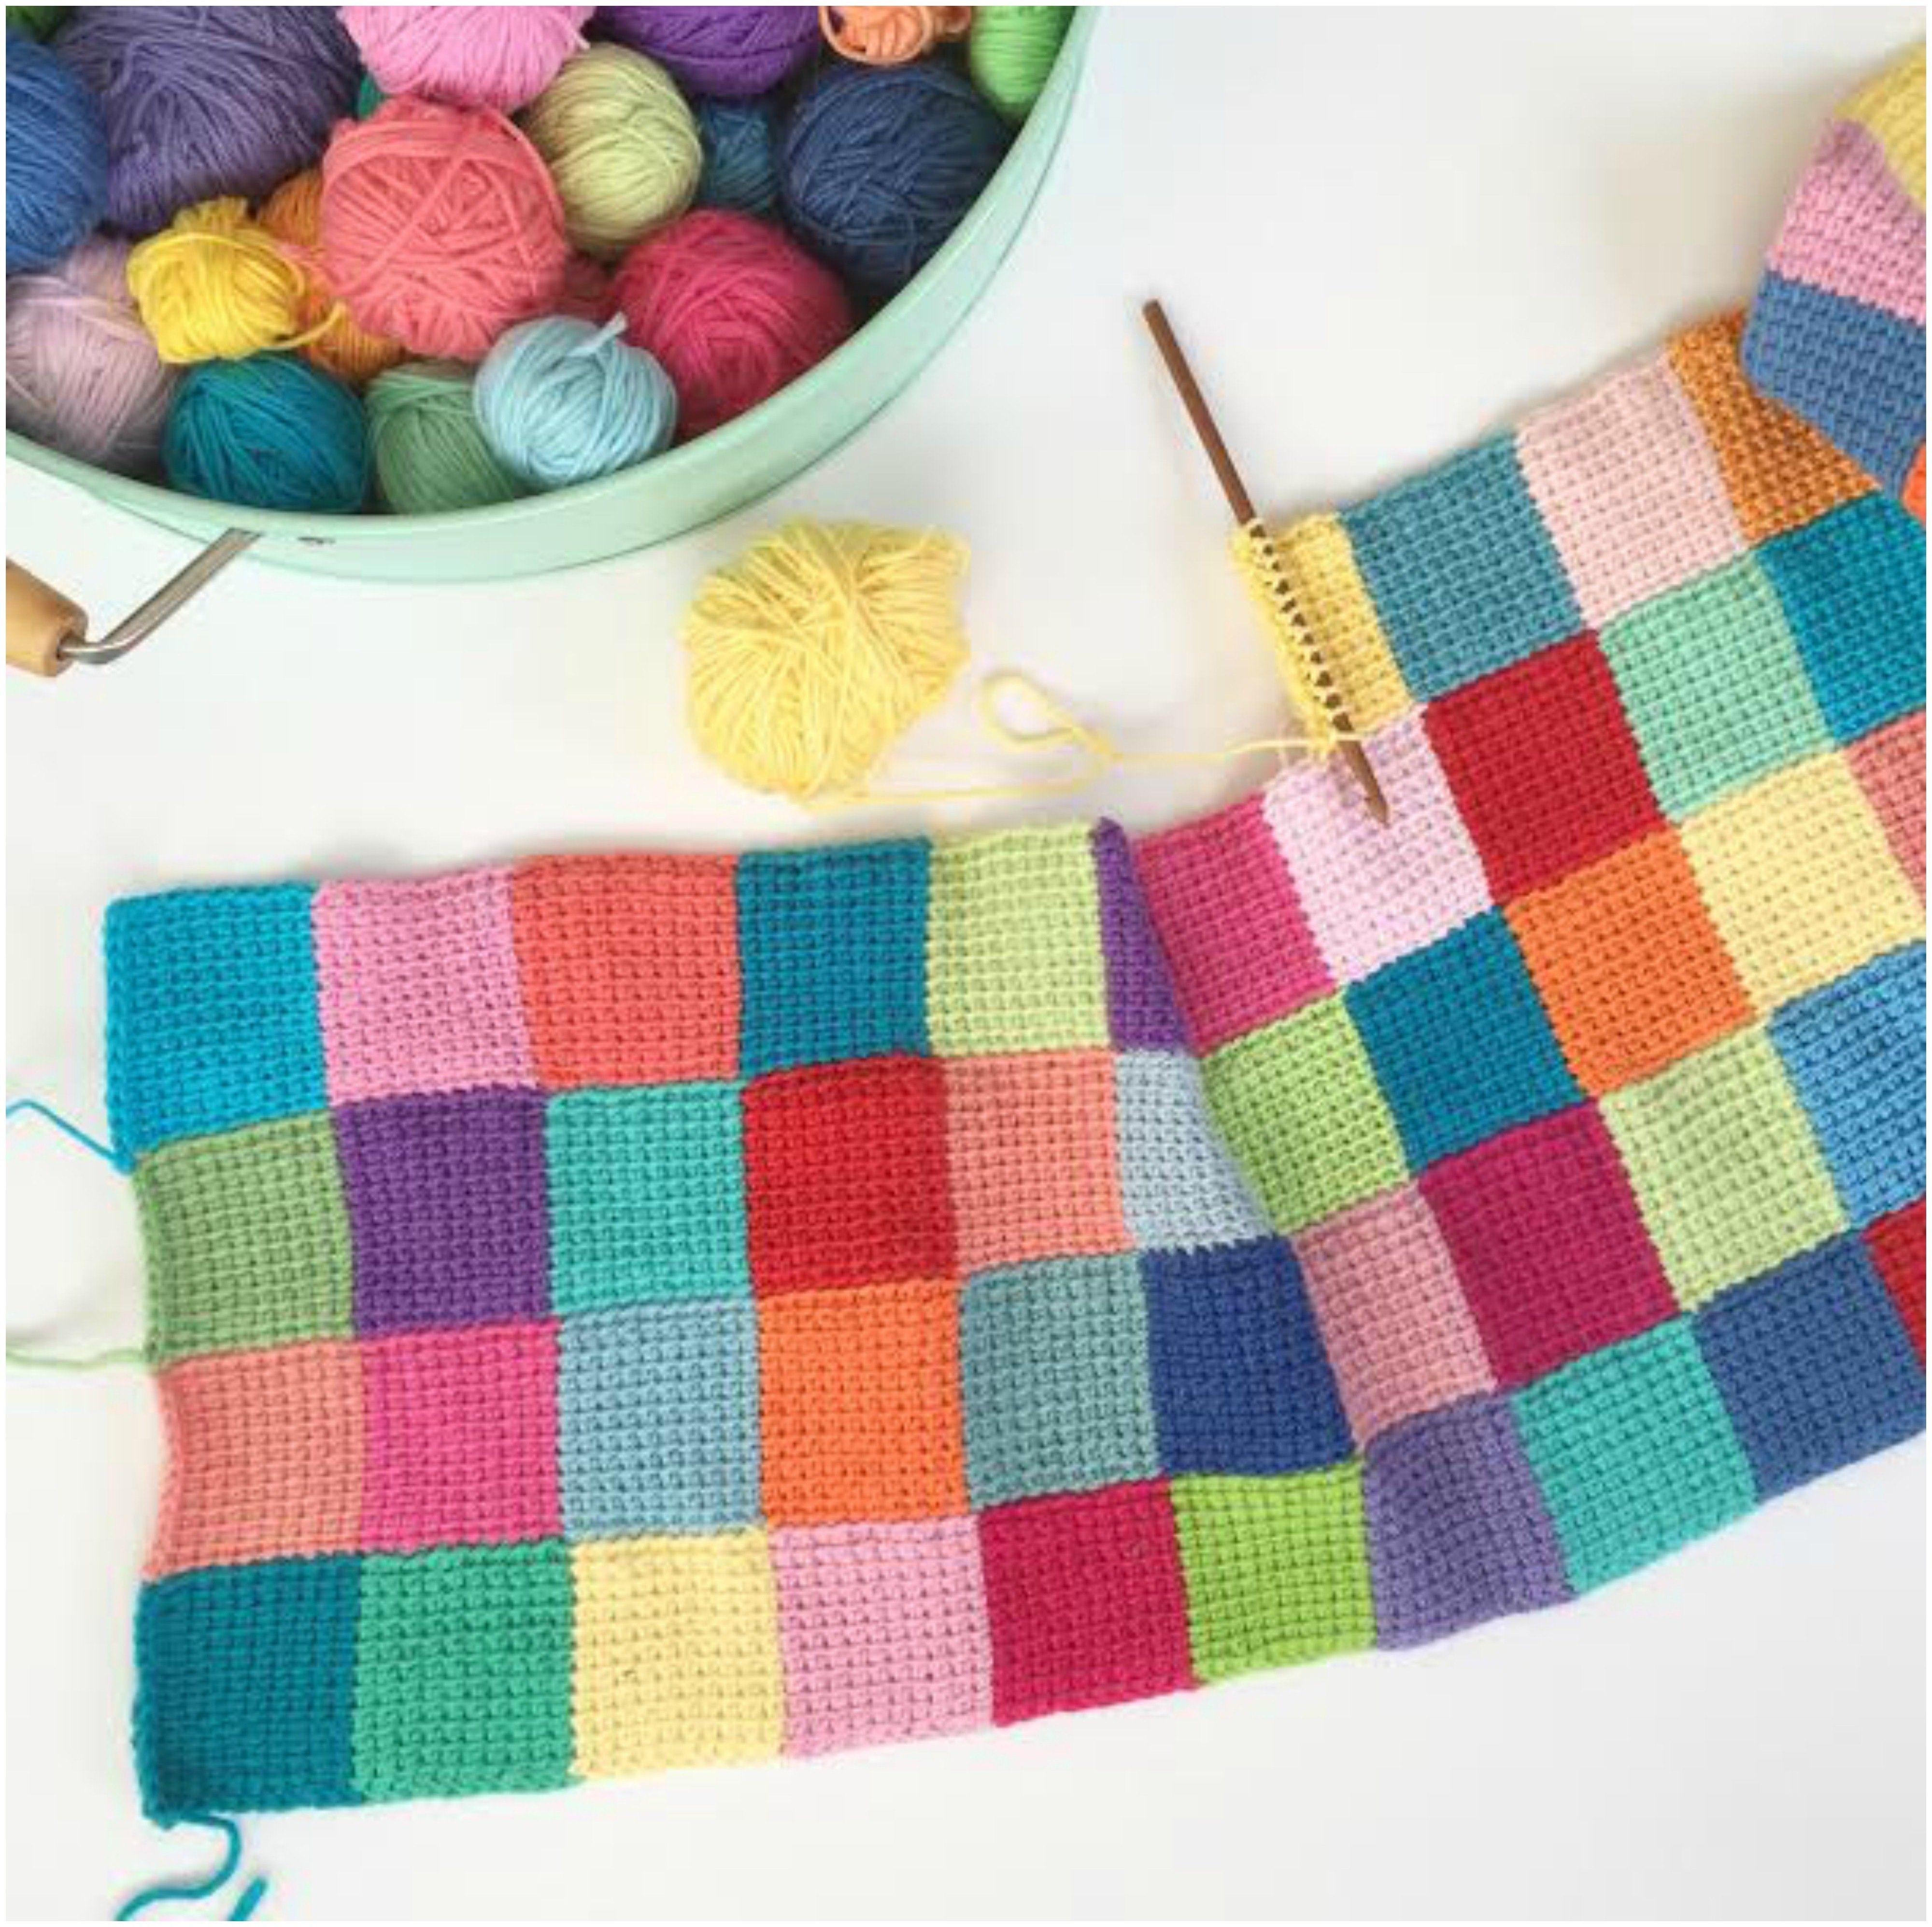 Entrelac blanket free crochet pattern yarns of fun pinterest entrelac blanket free crochet pattern bankloansurffo Images